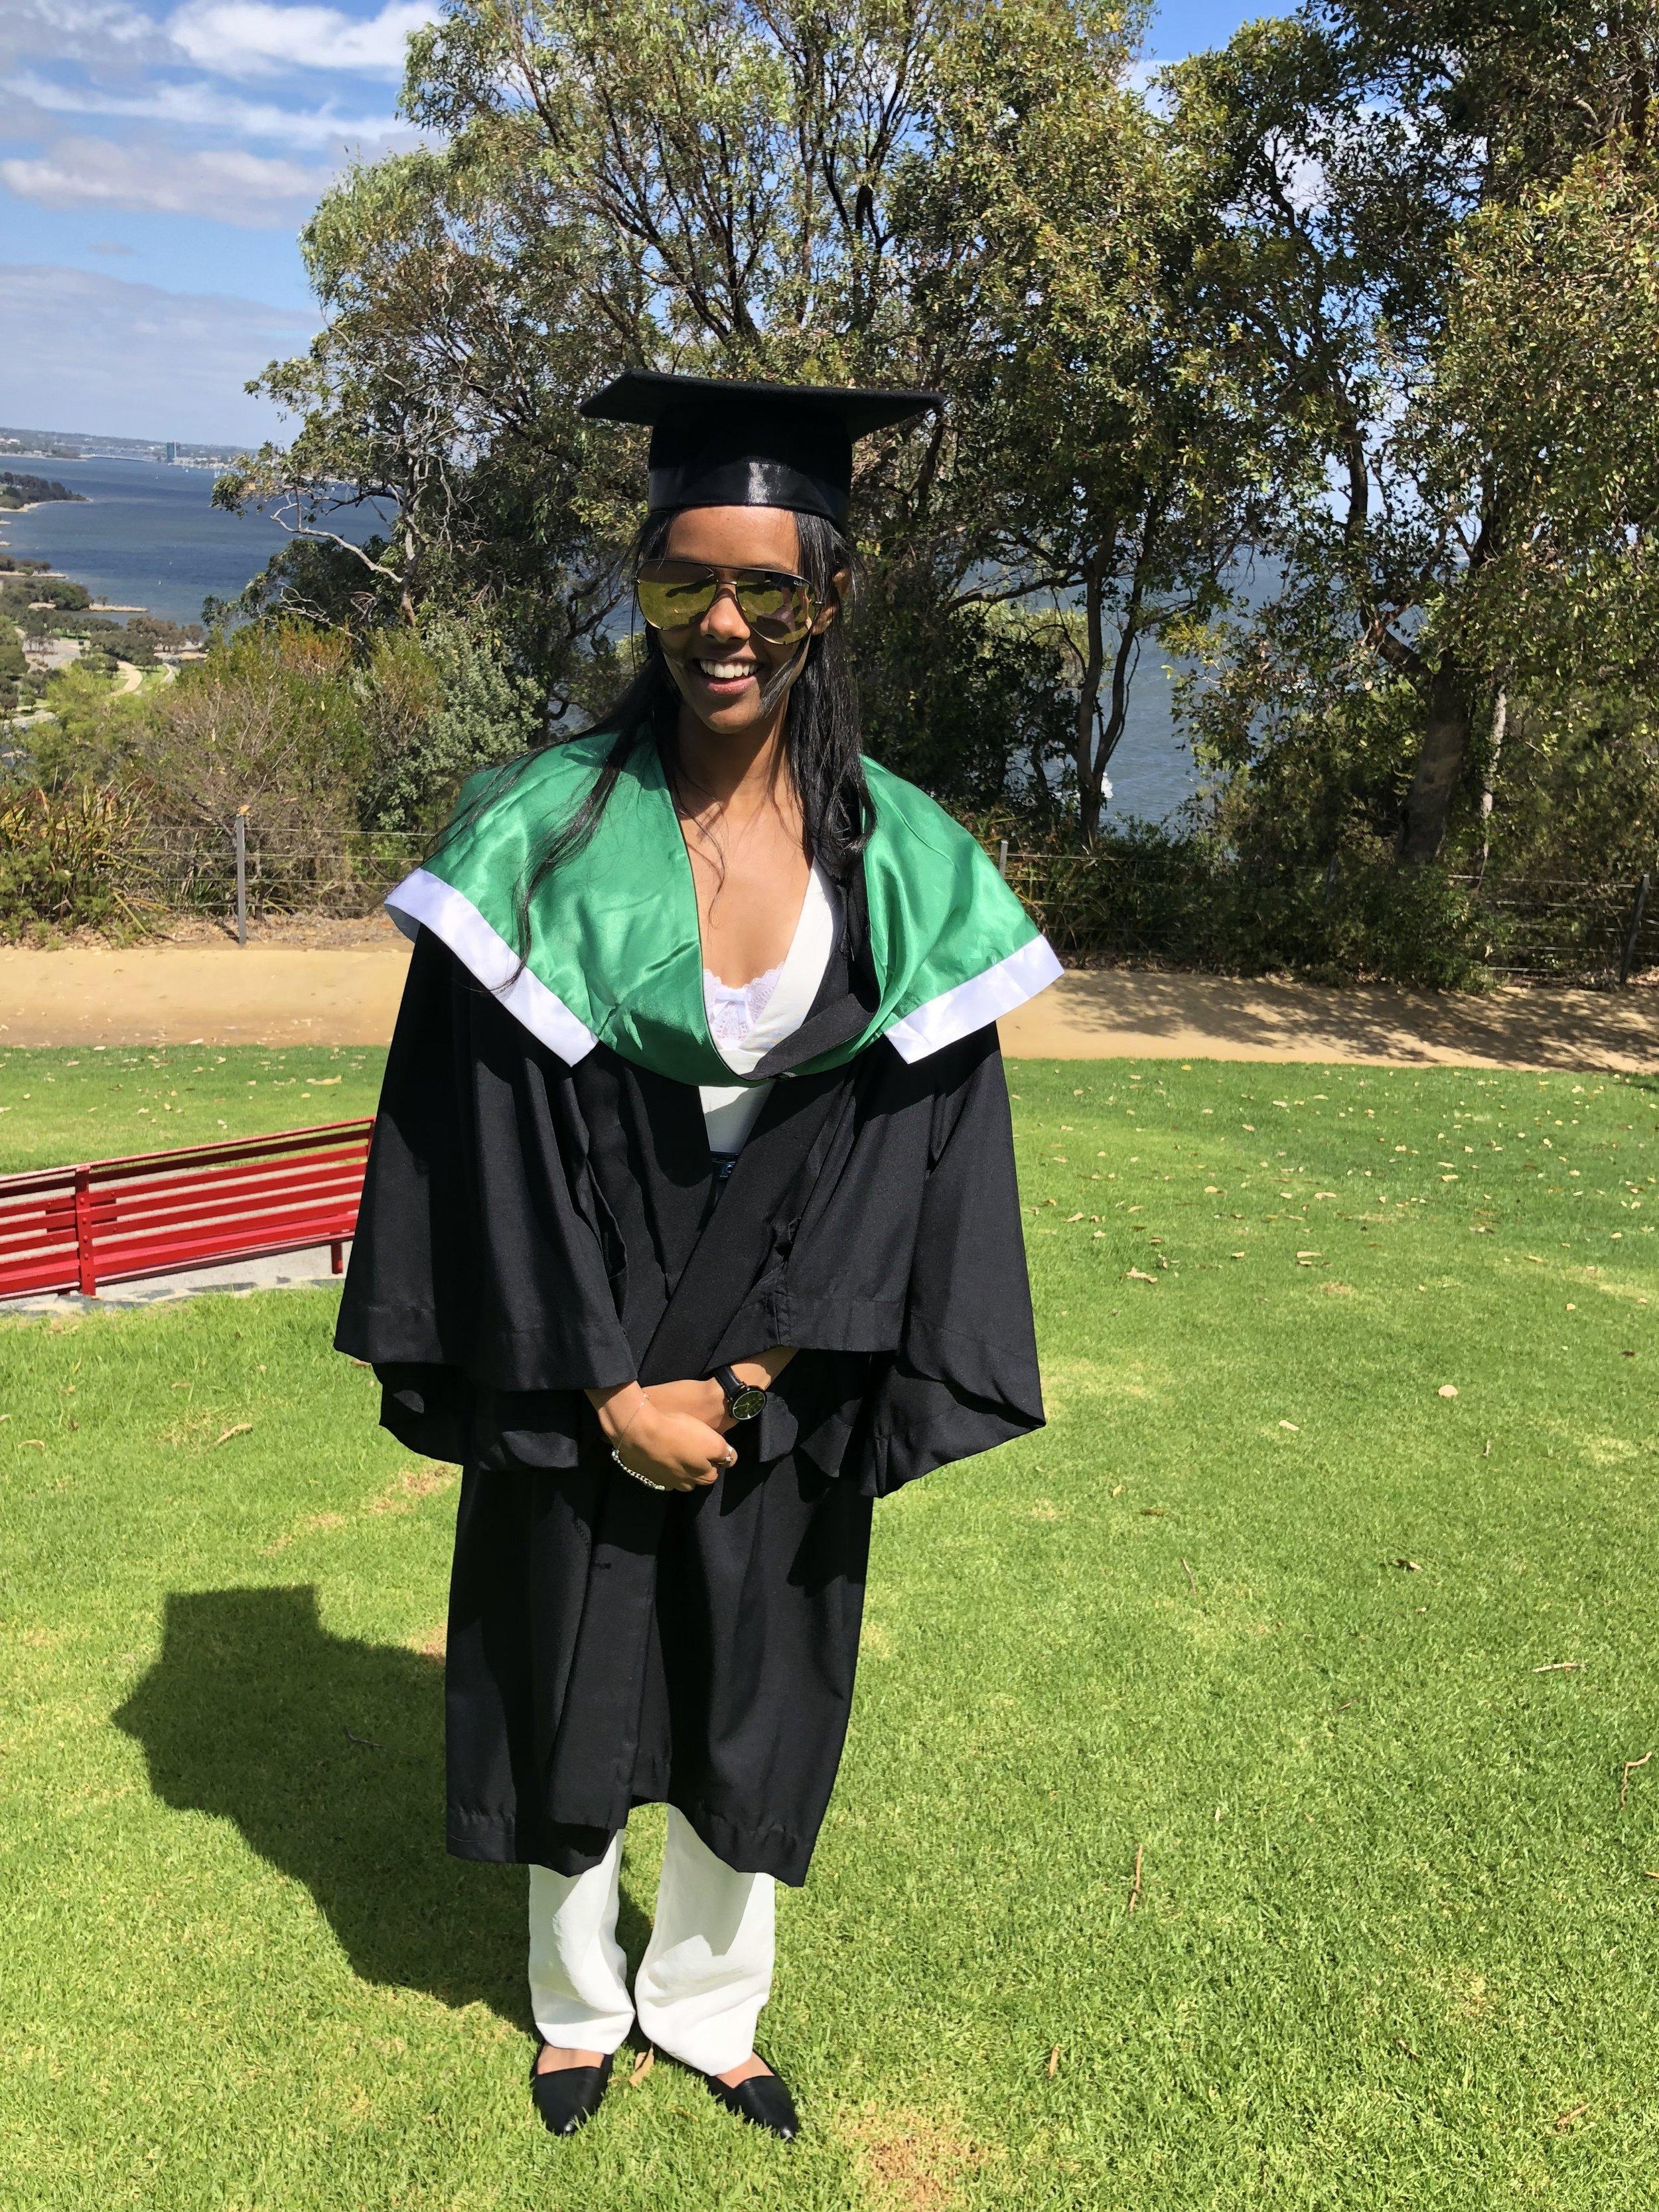 17 March 2018 - Sara graduated from UWA